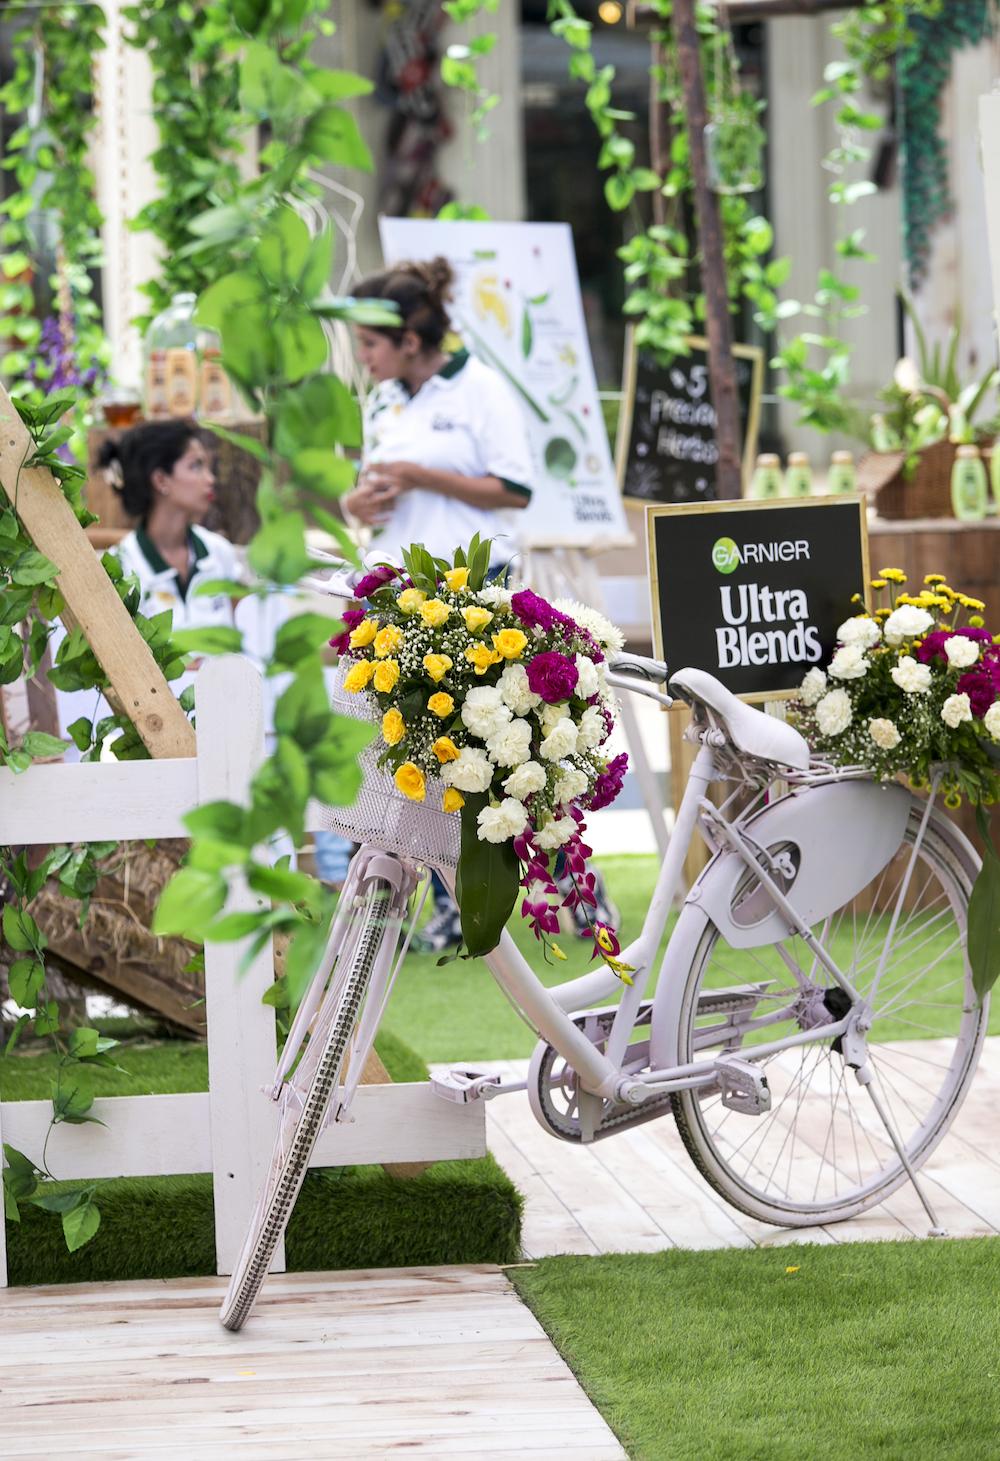 Garnier Ultra Blends Launch Event Personal Style